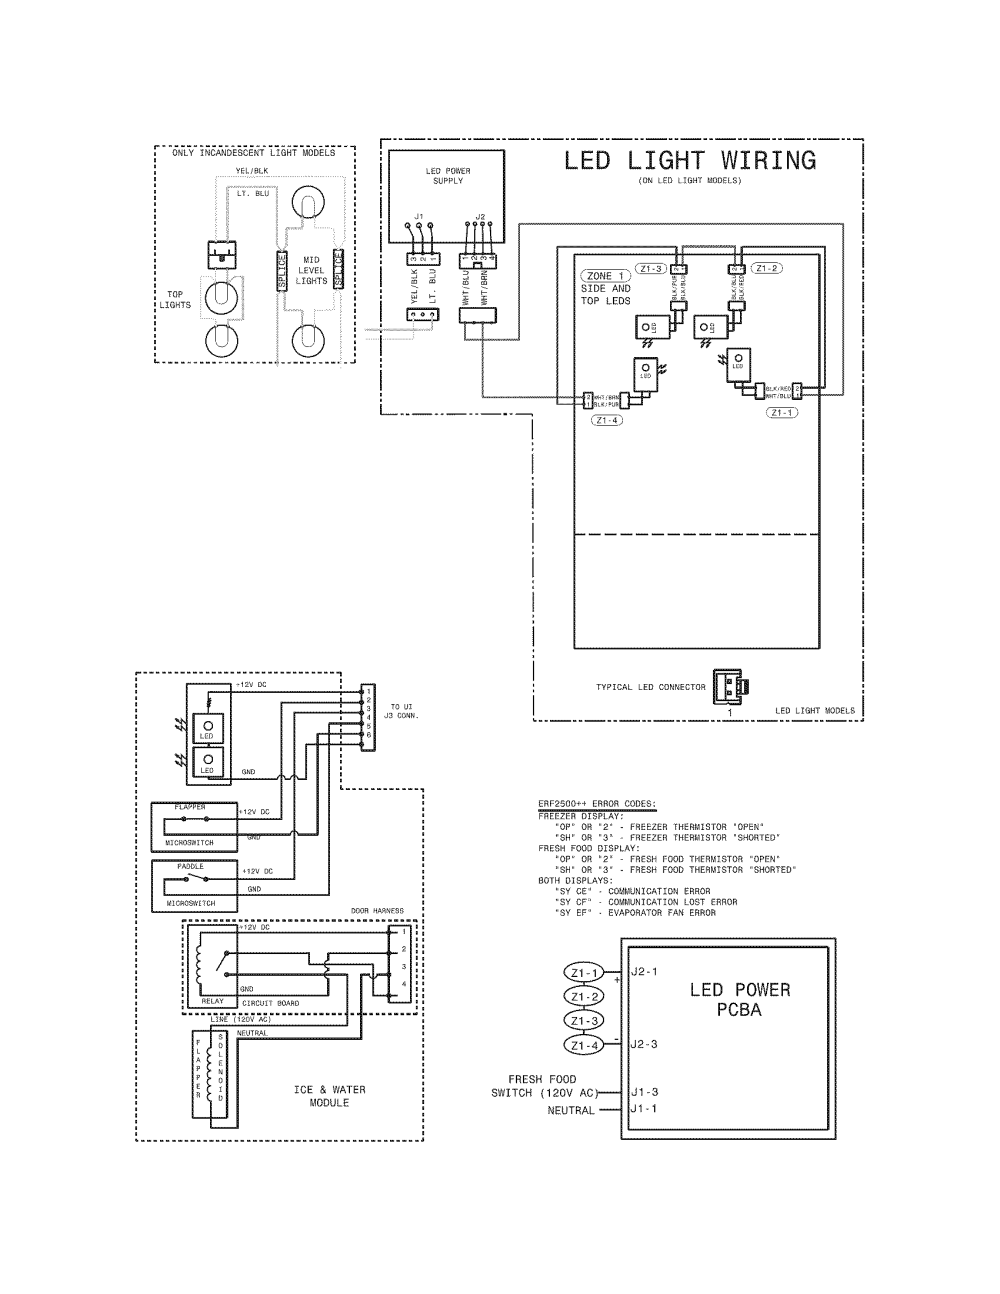 medium resolution of  electrolux refrigerator wiring schematic on electrolux wiring diagram electrolux vacuum parts diagram